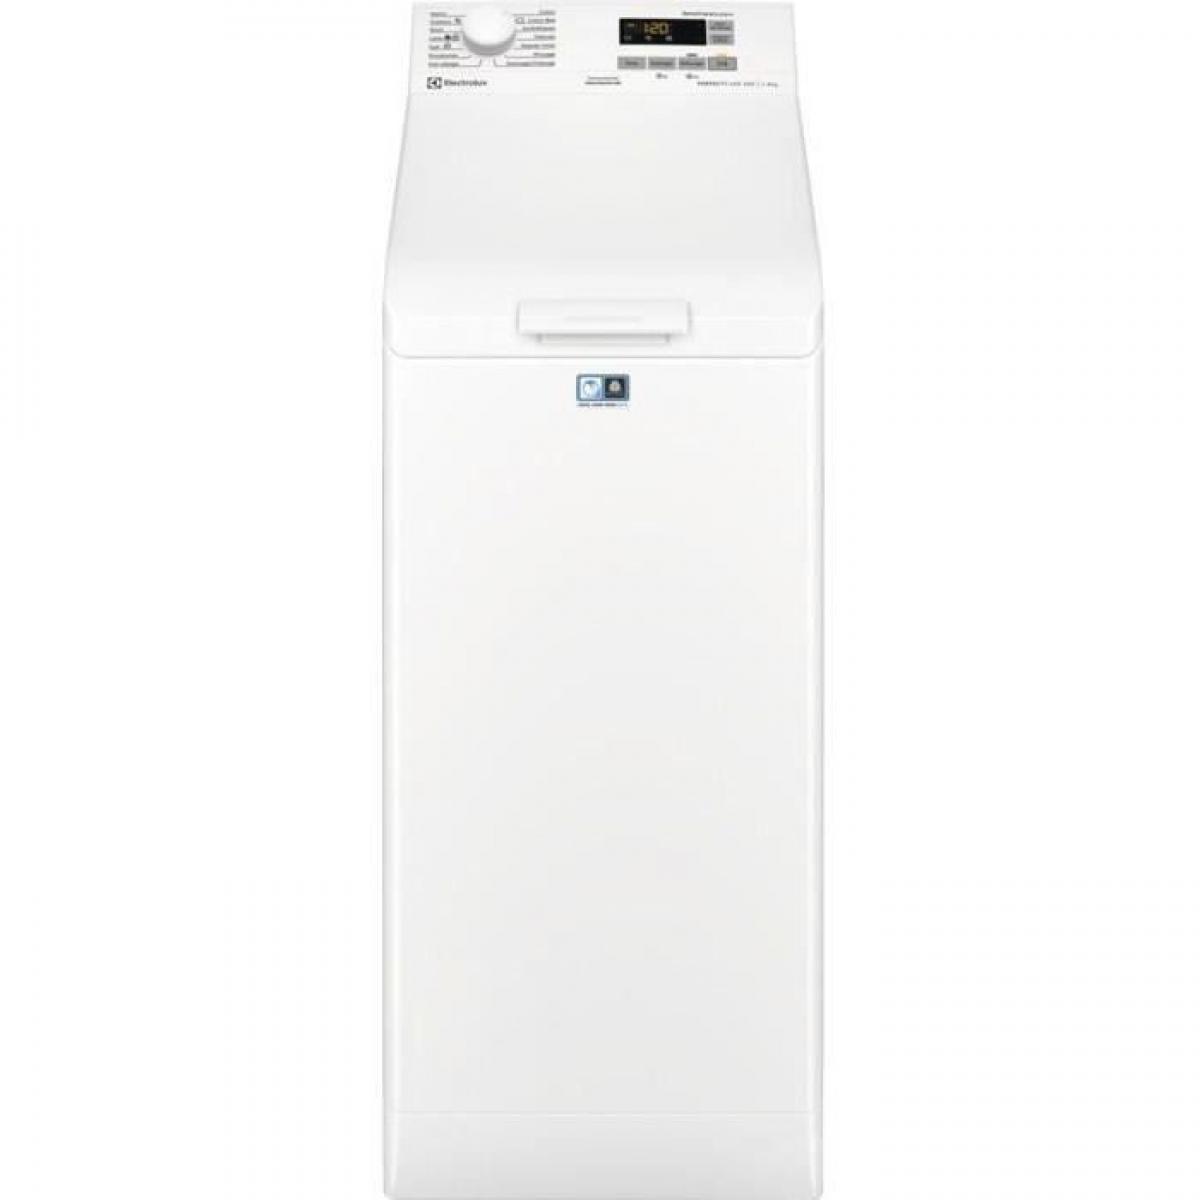 Electrolux Lave-linge top 6kg ELECTROLUX 1200tr/min 40cm, ELE7332543693696